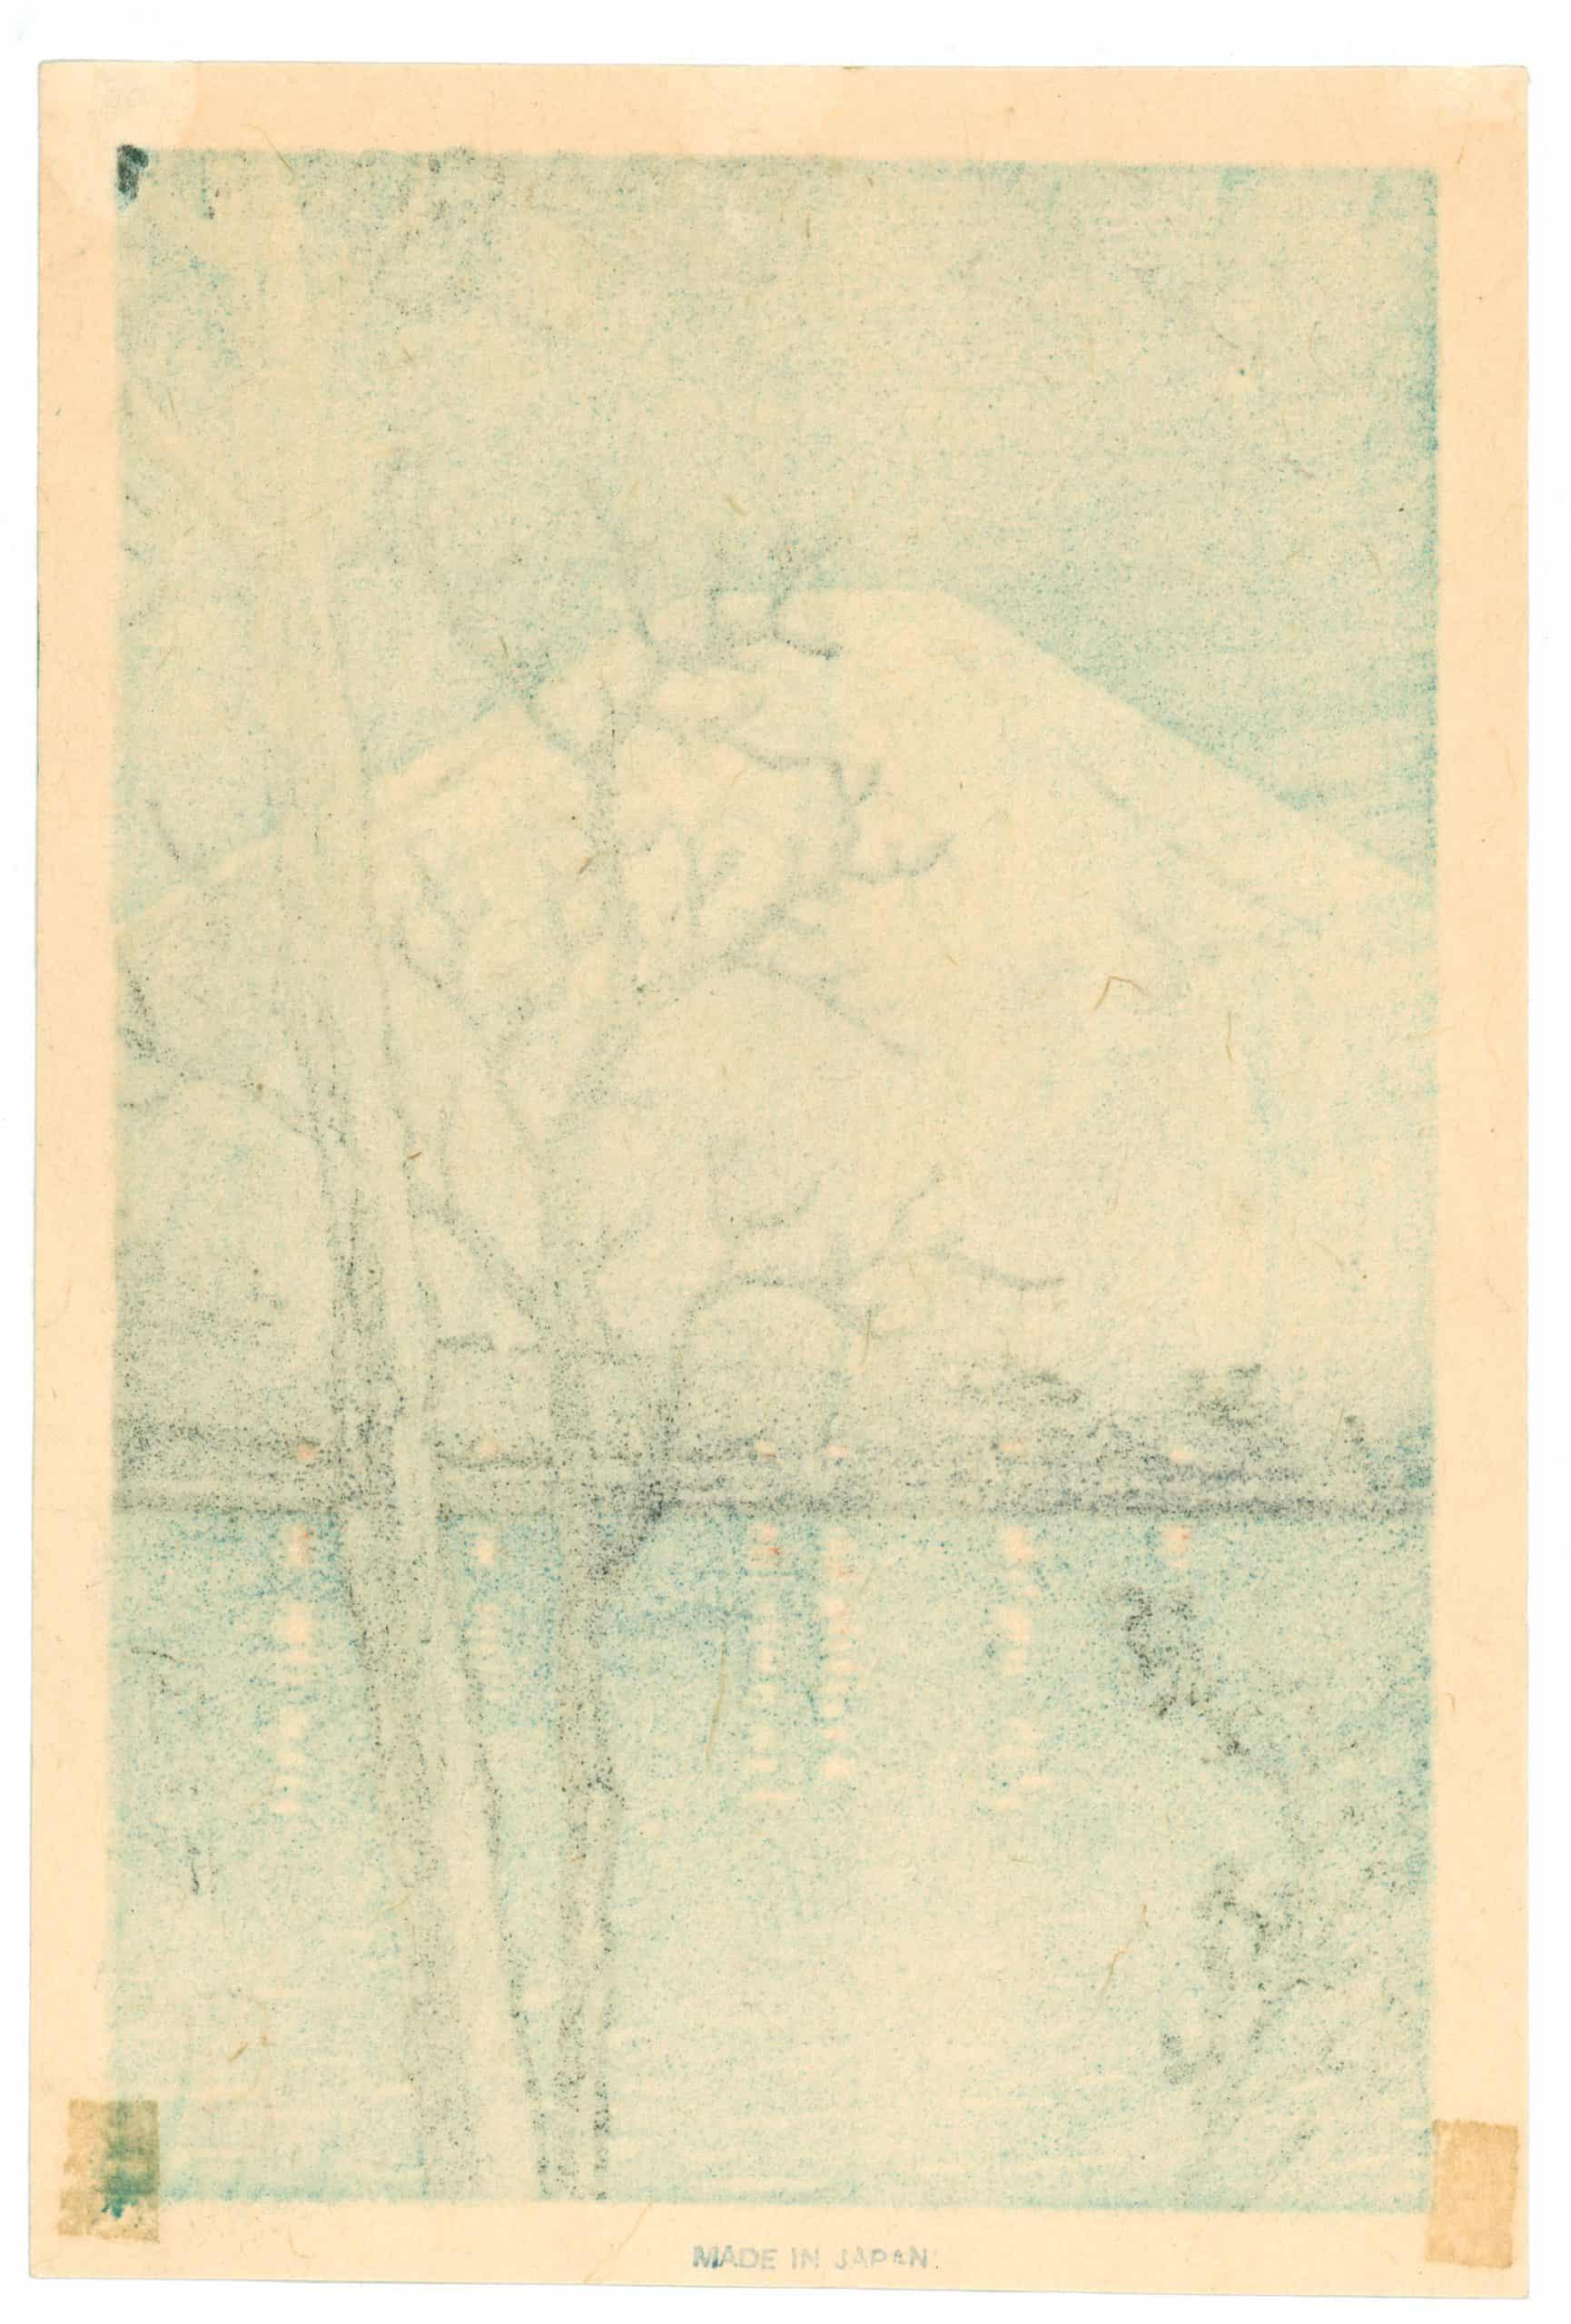 Kawase Hasui - Lake Kawaguchi (verso)